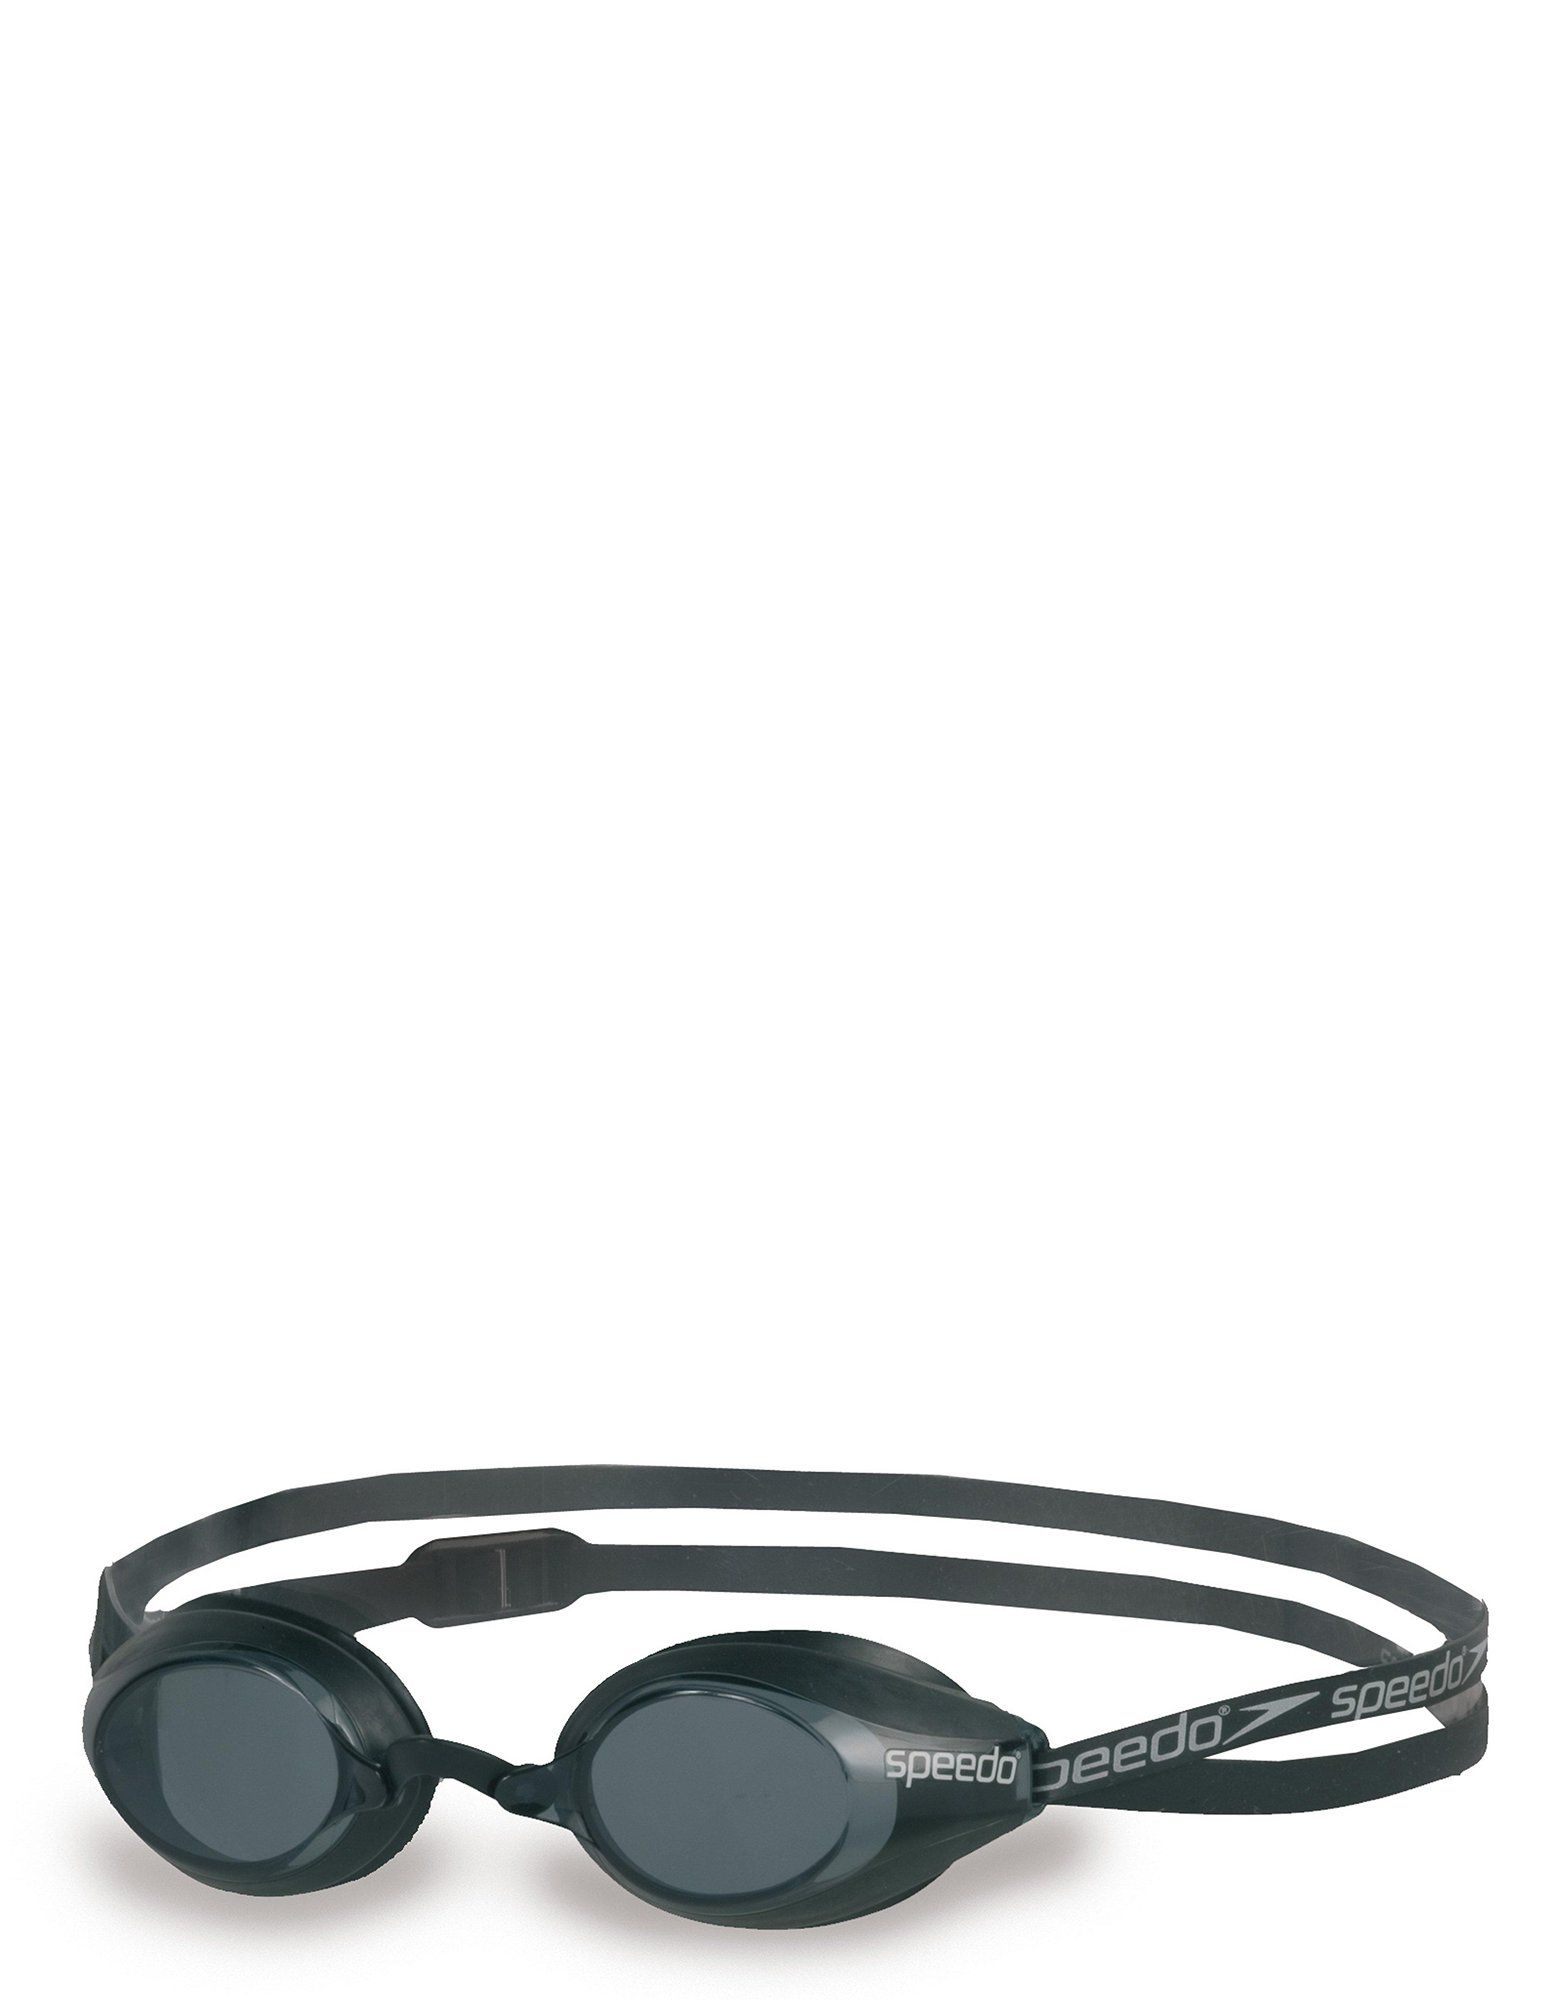 Speedo Speedsocket Goggles